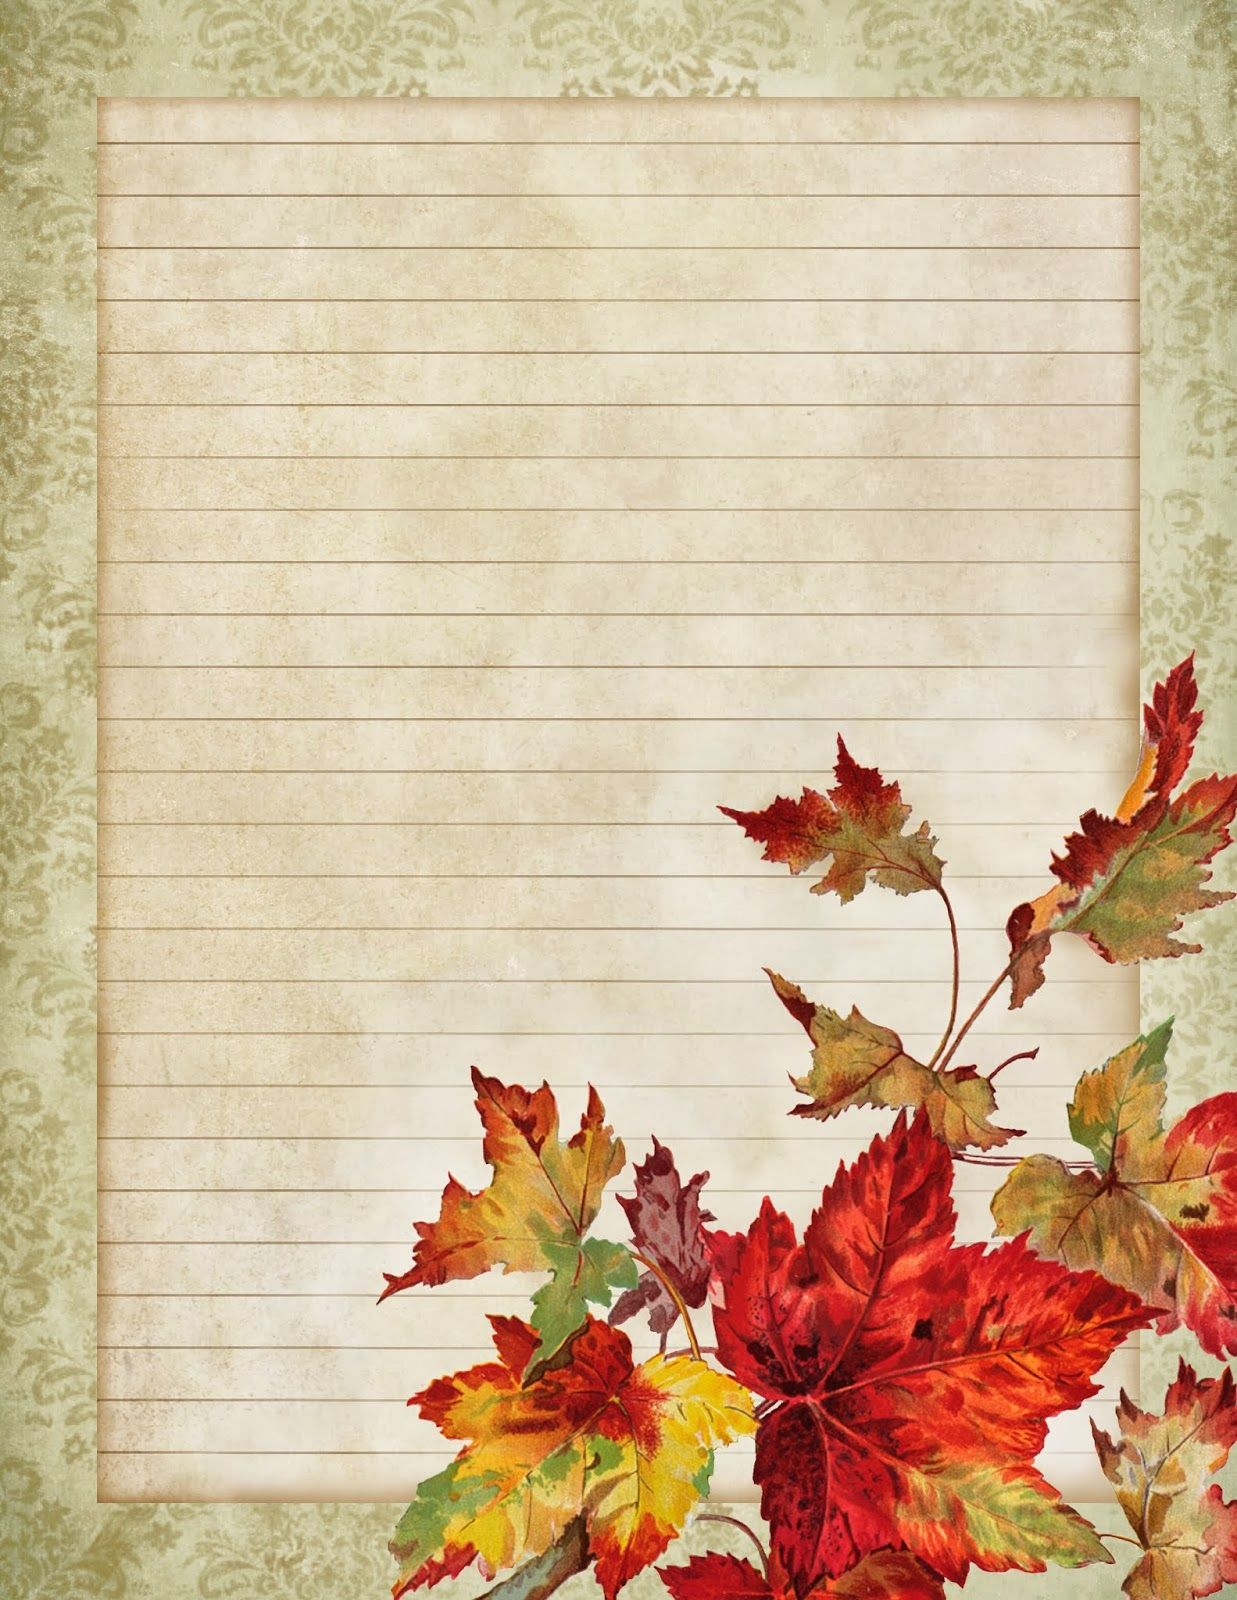 Ldr Love Letter Paper Stationary Printable Printable Stationery Letter Paper